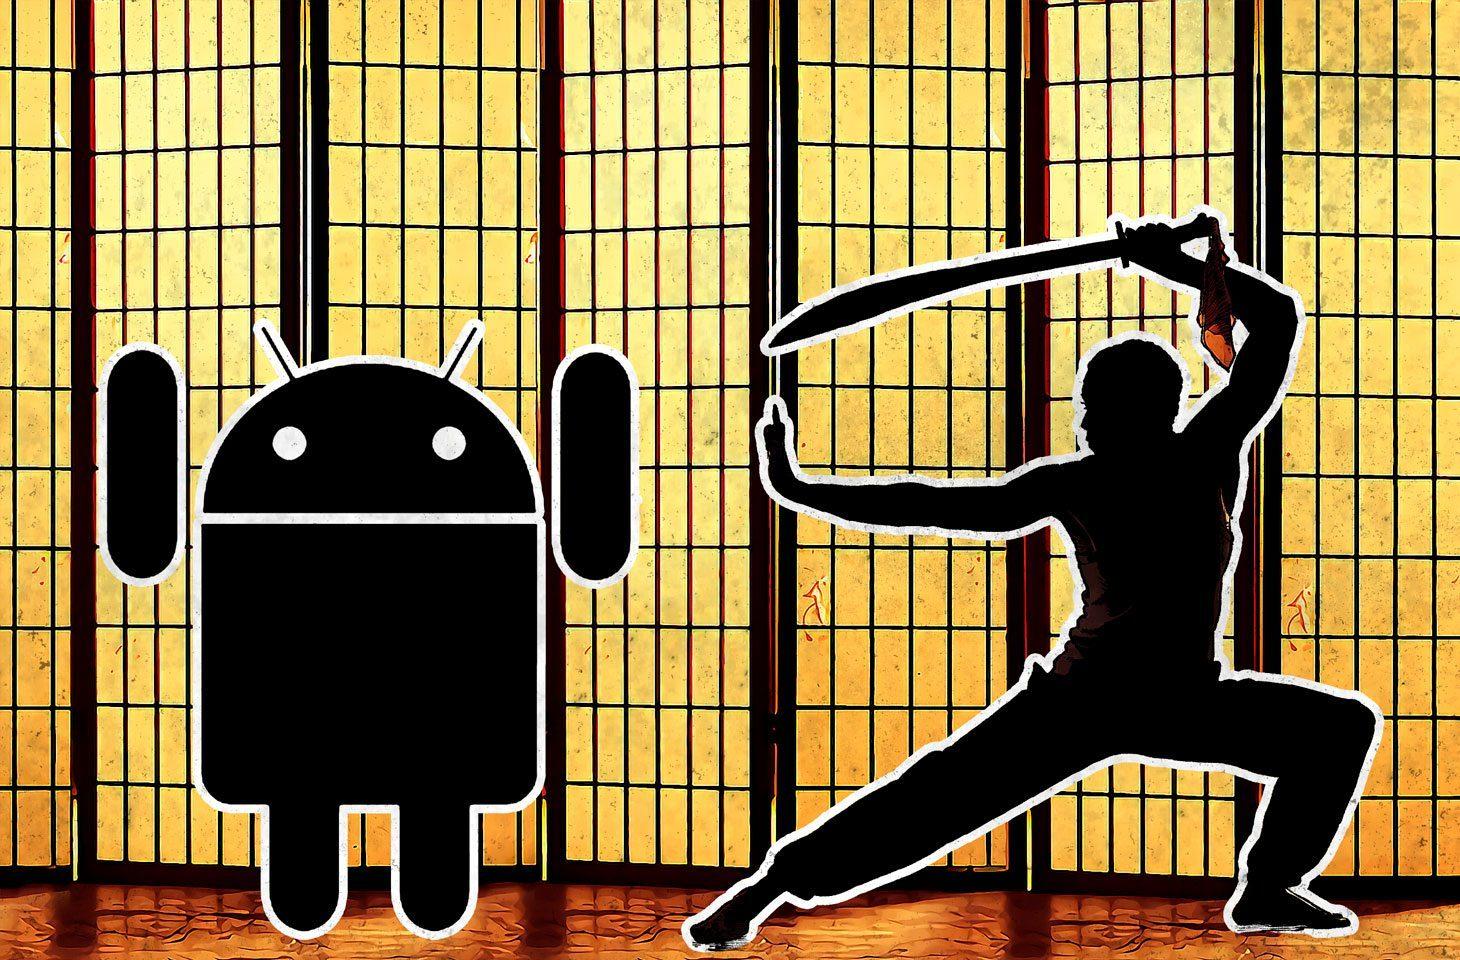 kaspersky cloak and dagger une faille sur toutes les versions android - Kaspersky: Cloak and Dagger : une faille sur toutes les versions Android